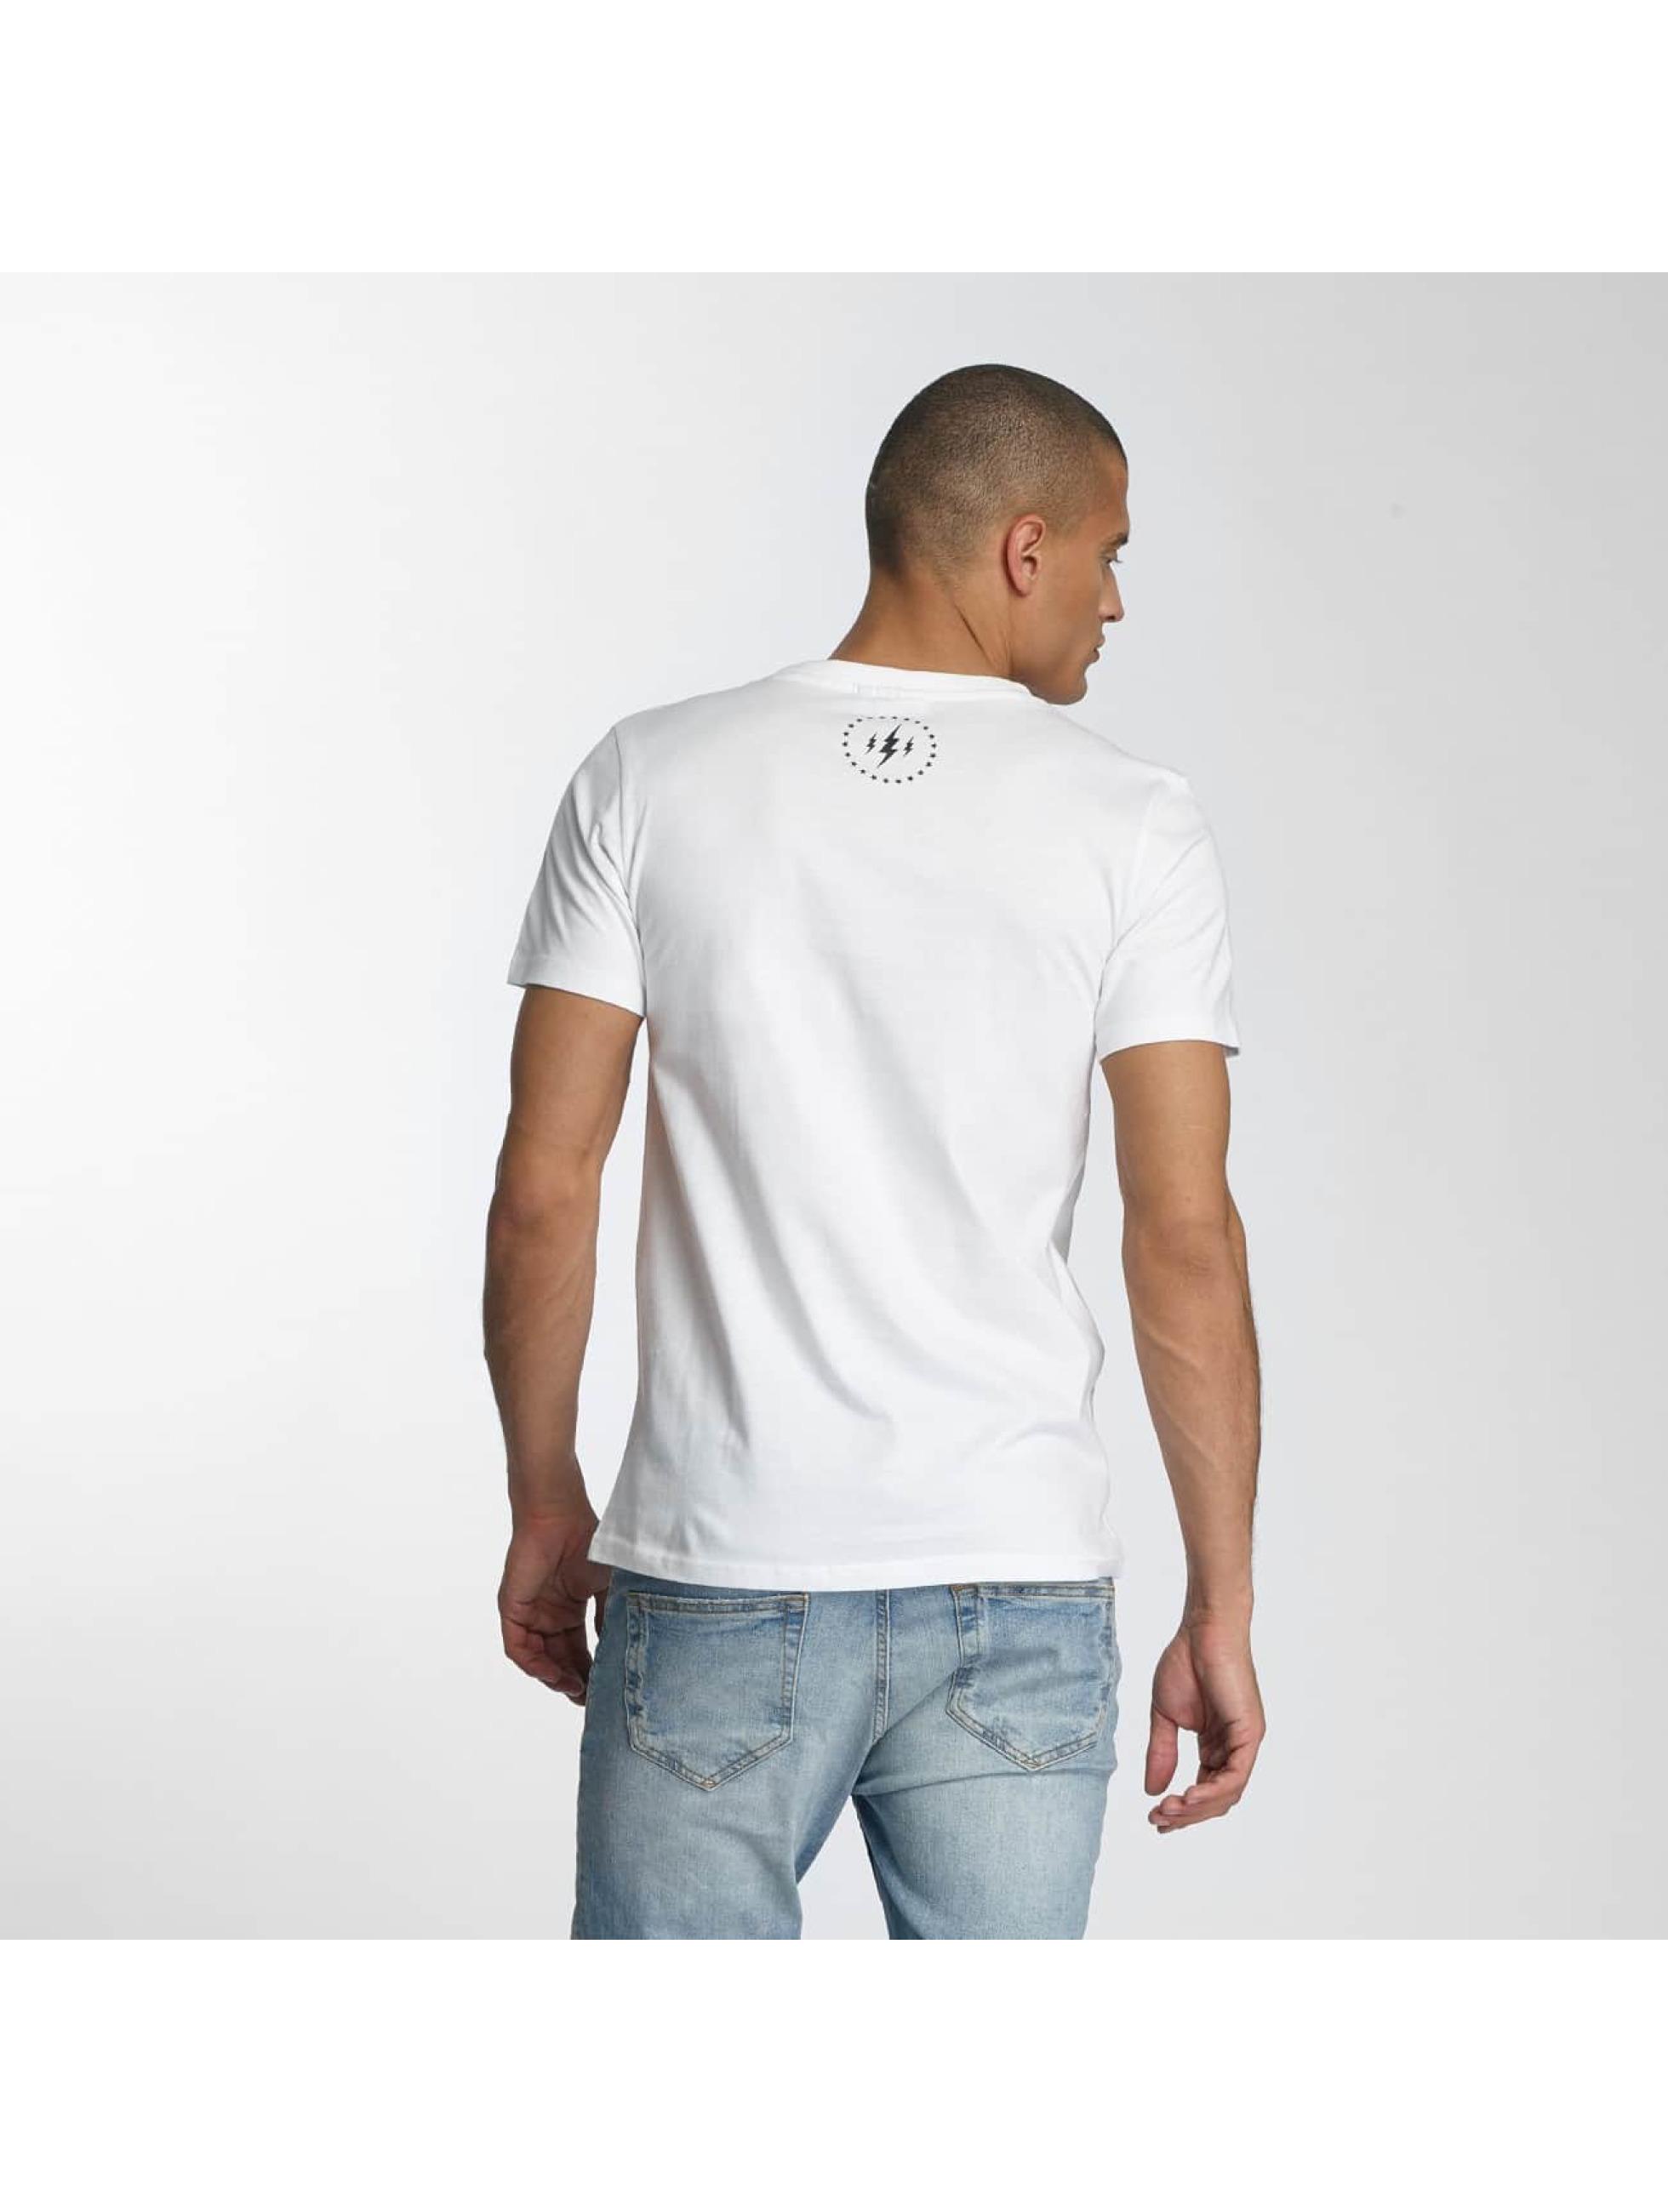 TrueSpin t-shirt 5 wit